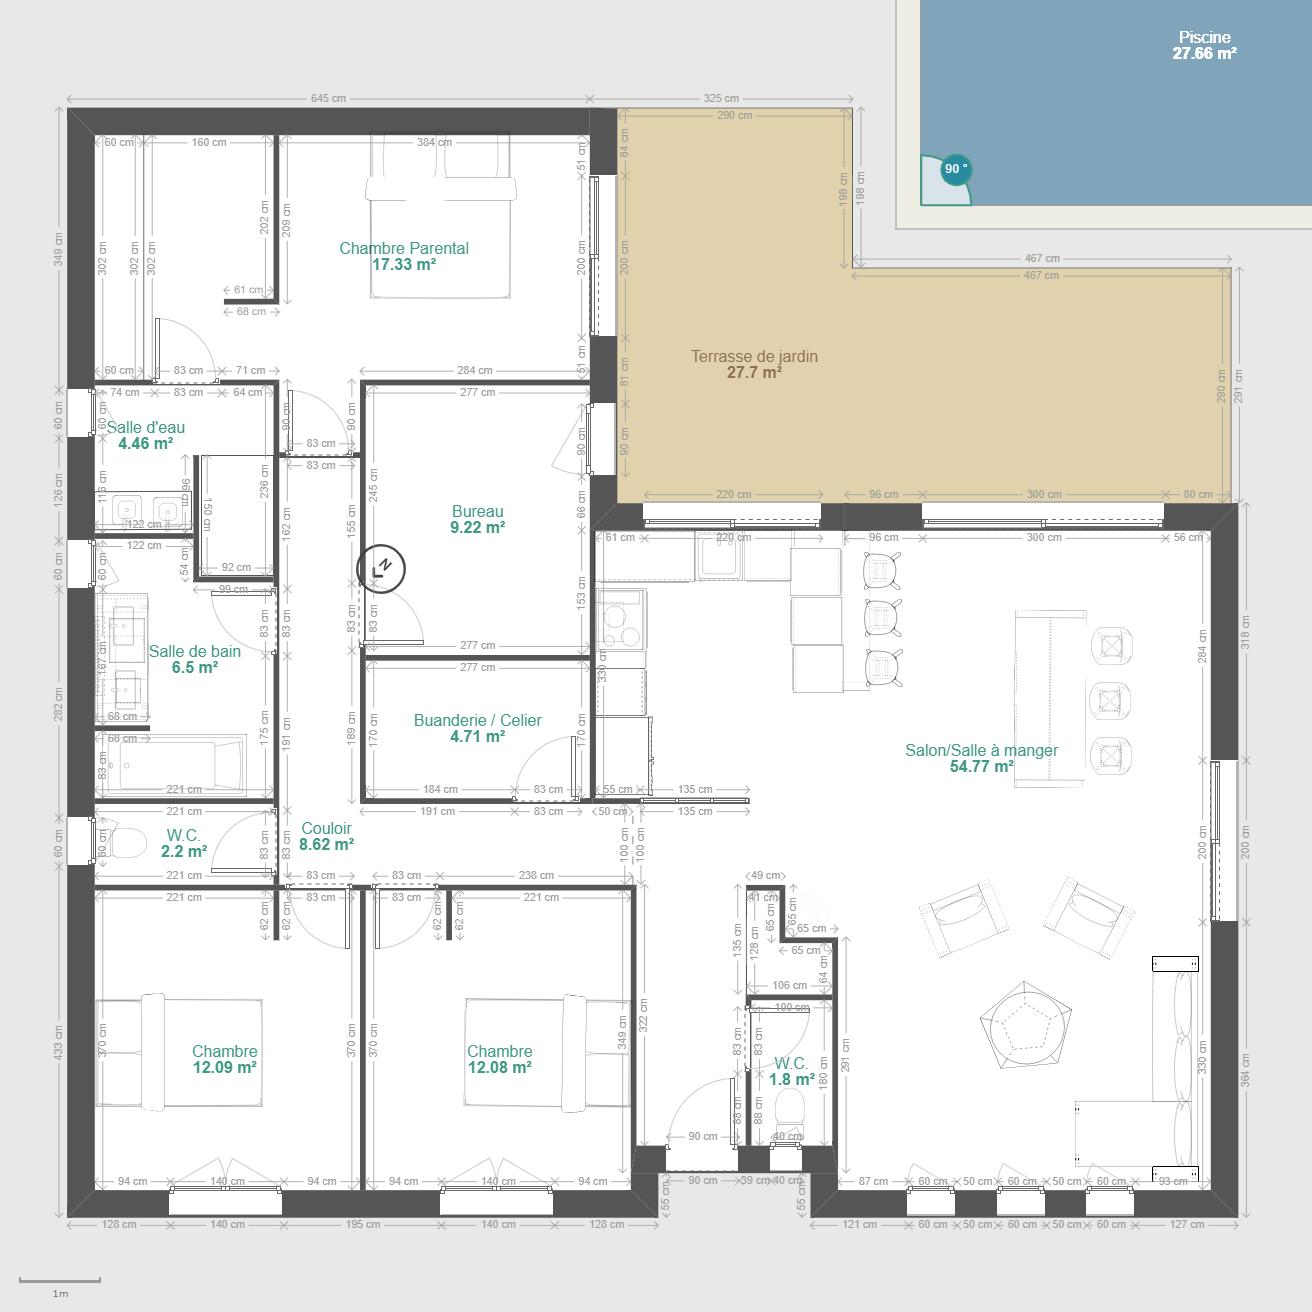 Epingle Par Papa Seydi Sur Mes Enregistrements En 2021 Plan Maison 100m2 Plan Maison 90m2 Plan Maison